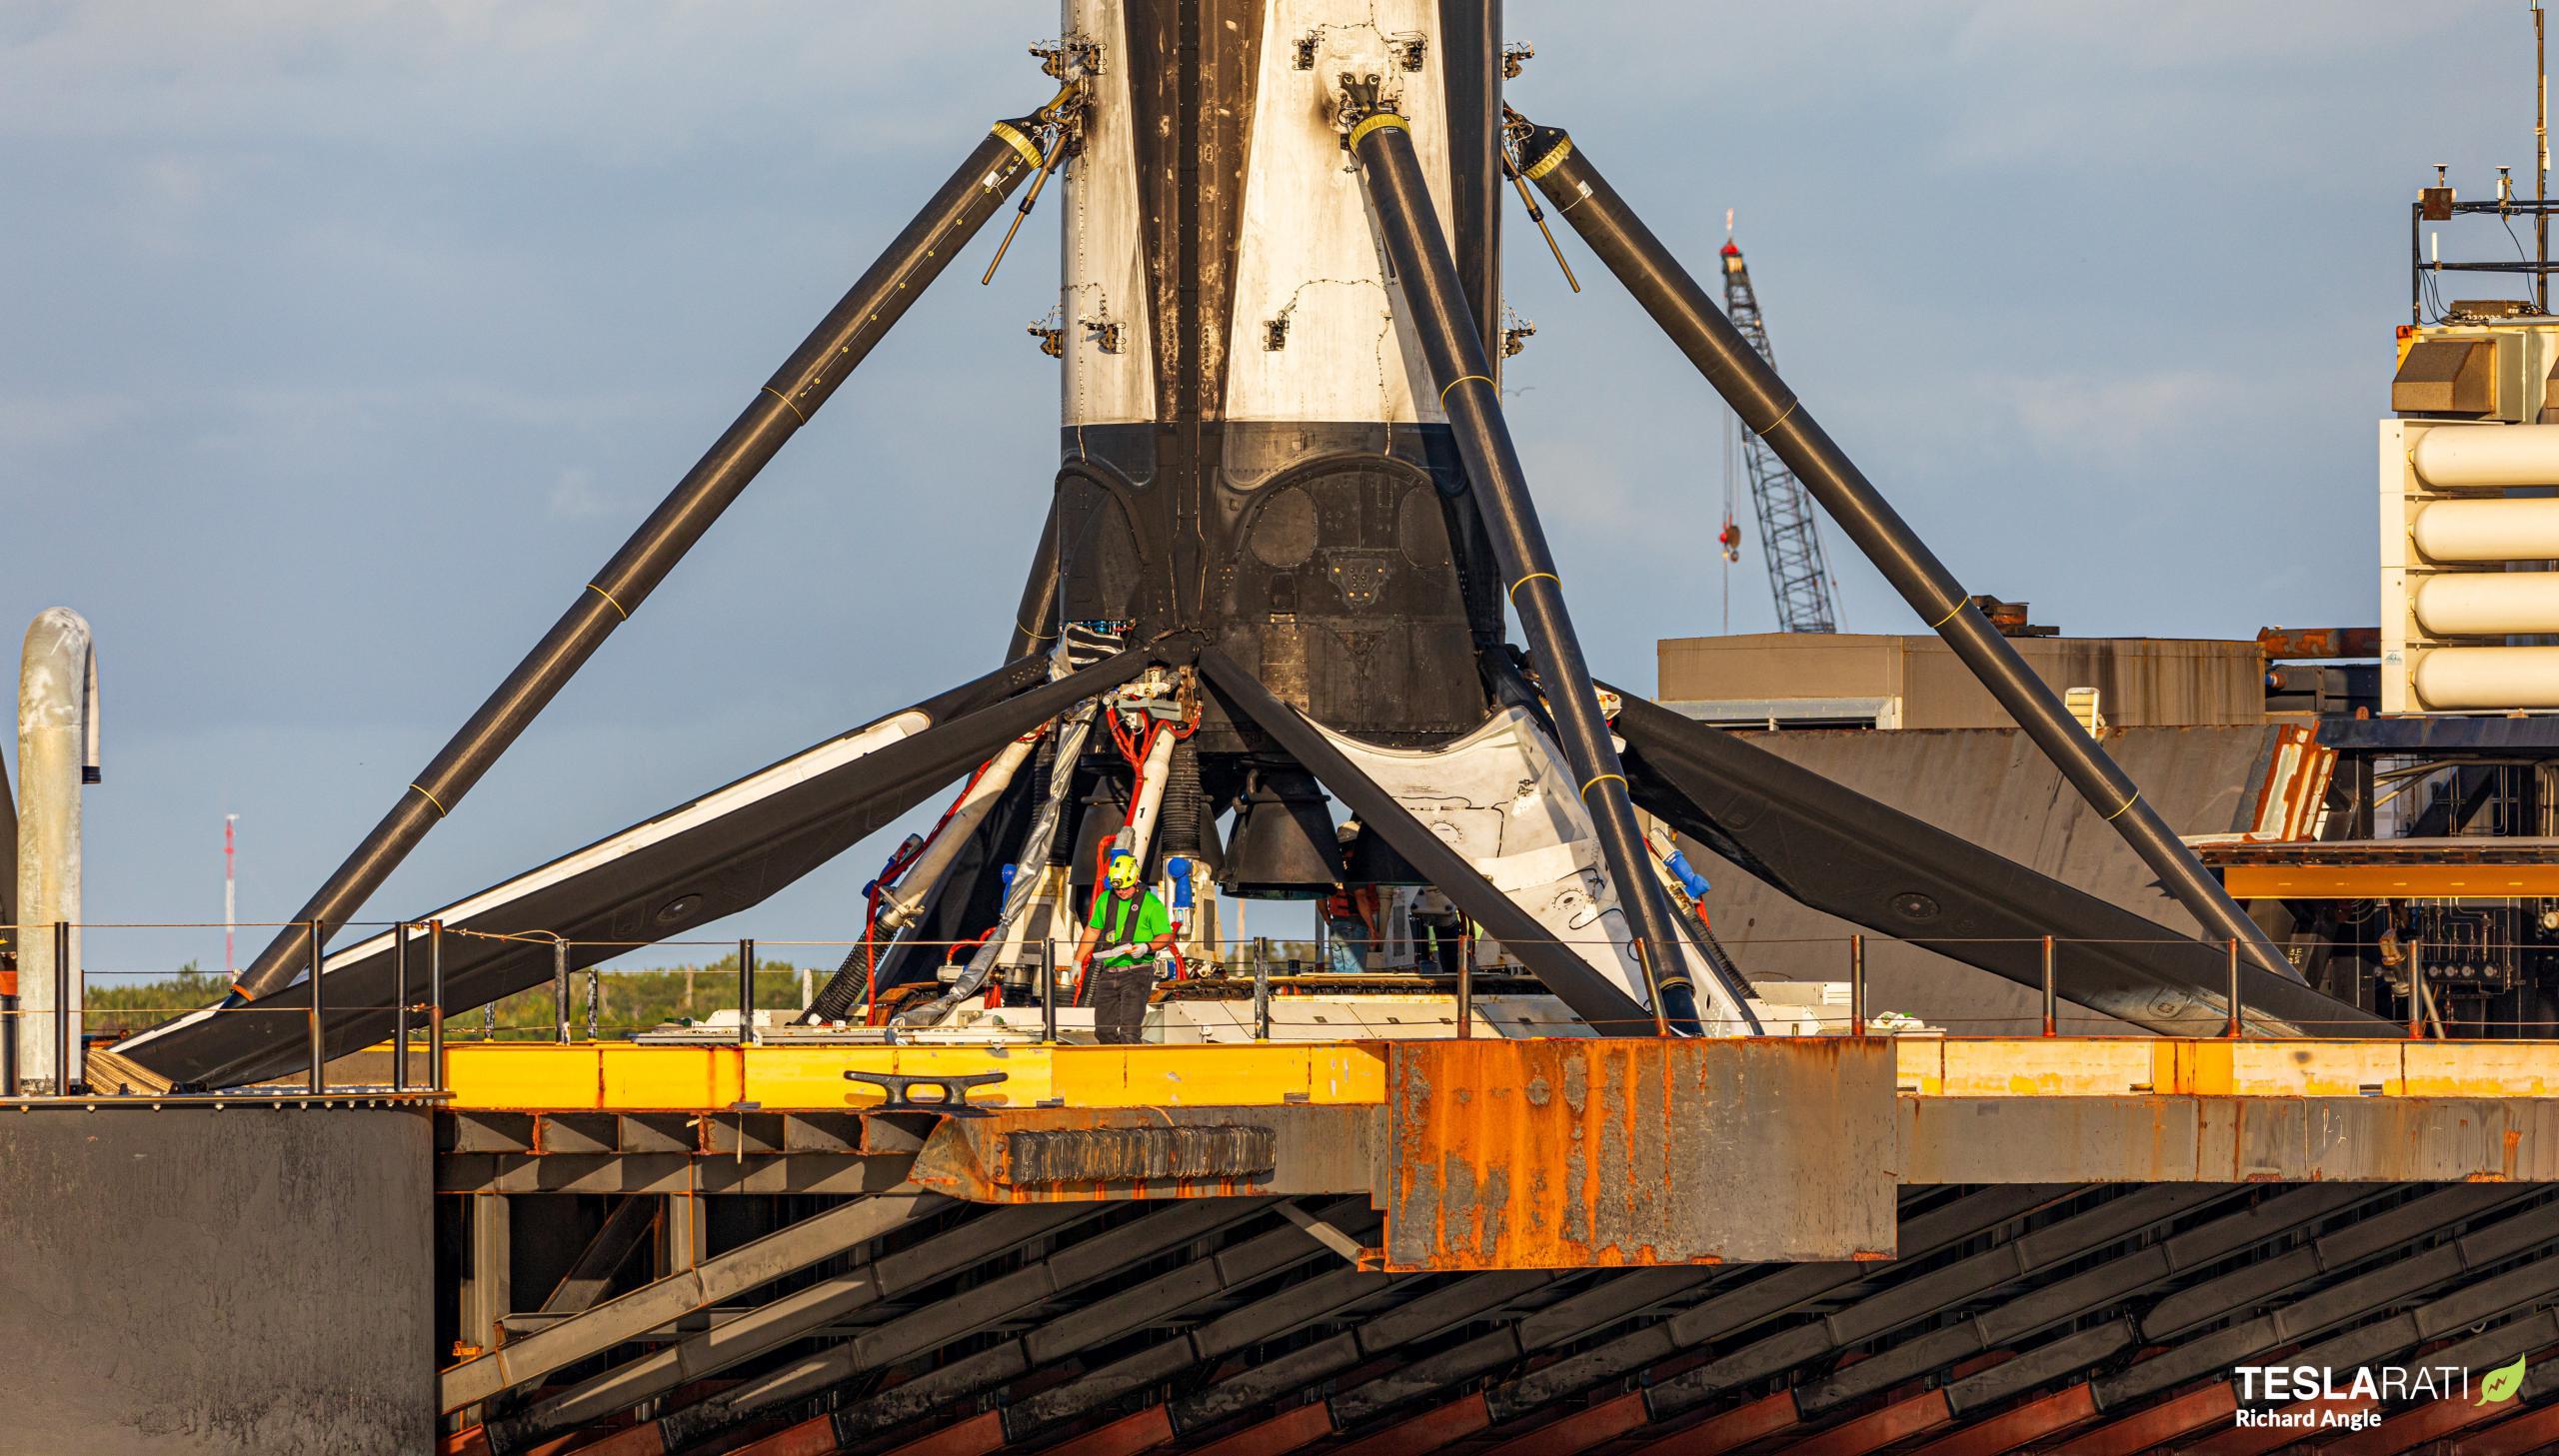 Starlink-16 Falcon 9 B1051 012421 (Richard Angle) JRTI return 3 crop (c)